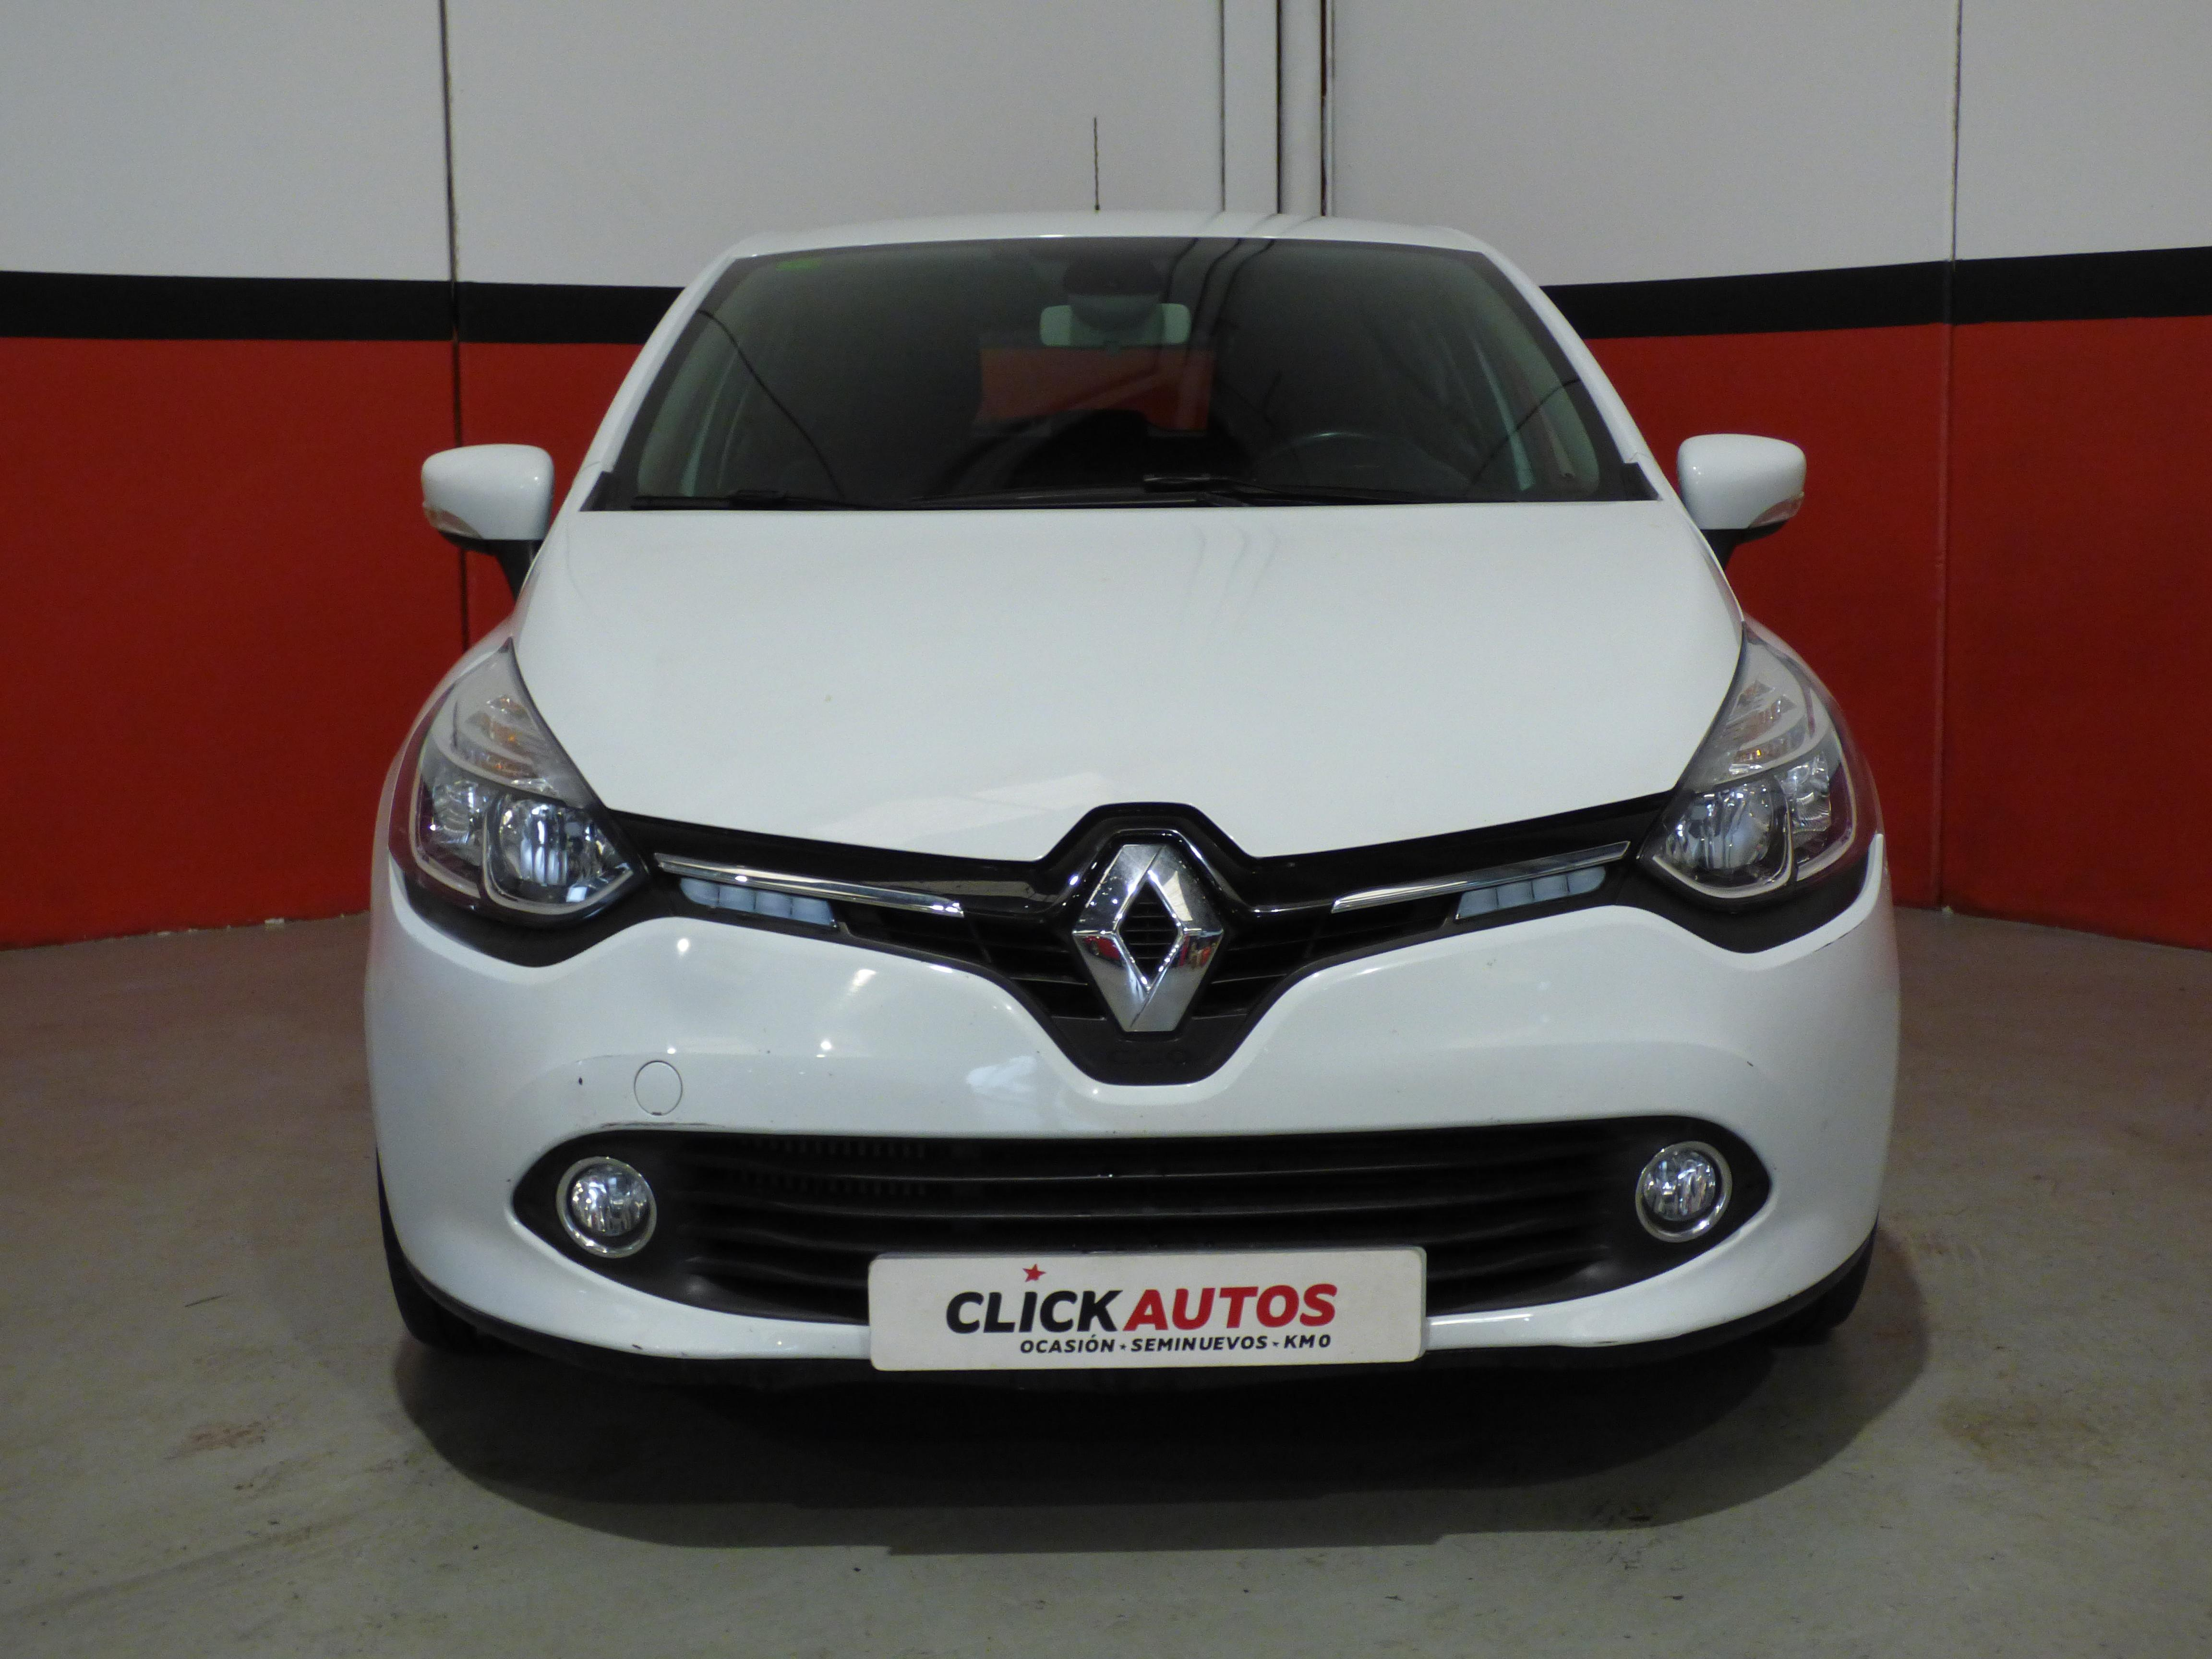 Clio 1.5 DCI 90CV Dynamique Energy 13